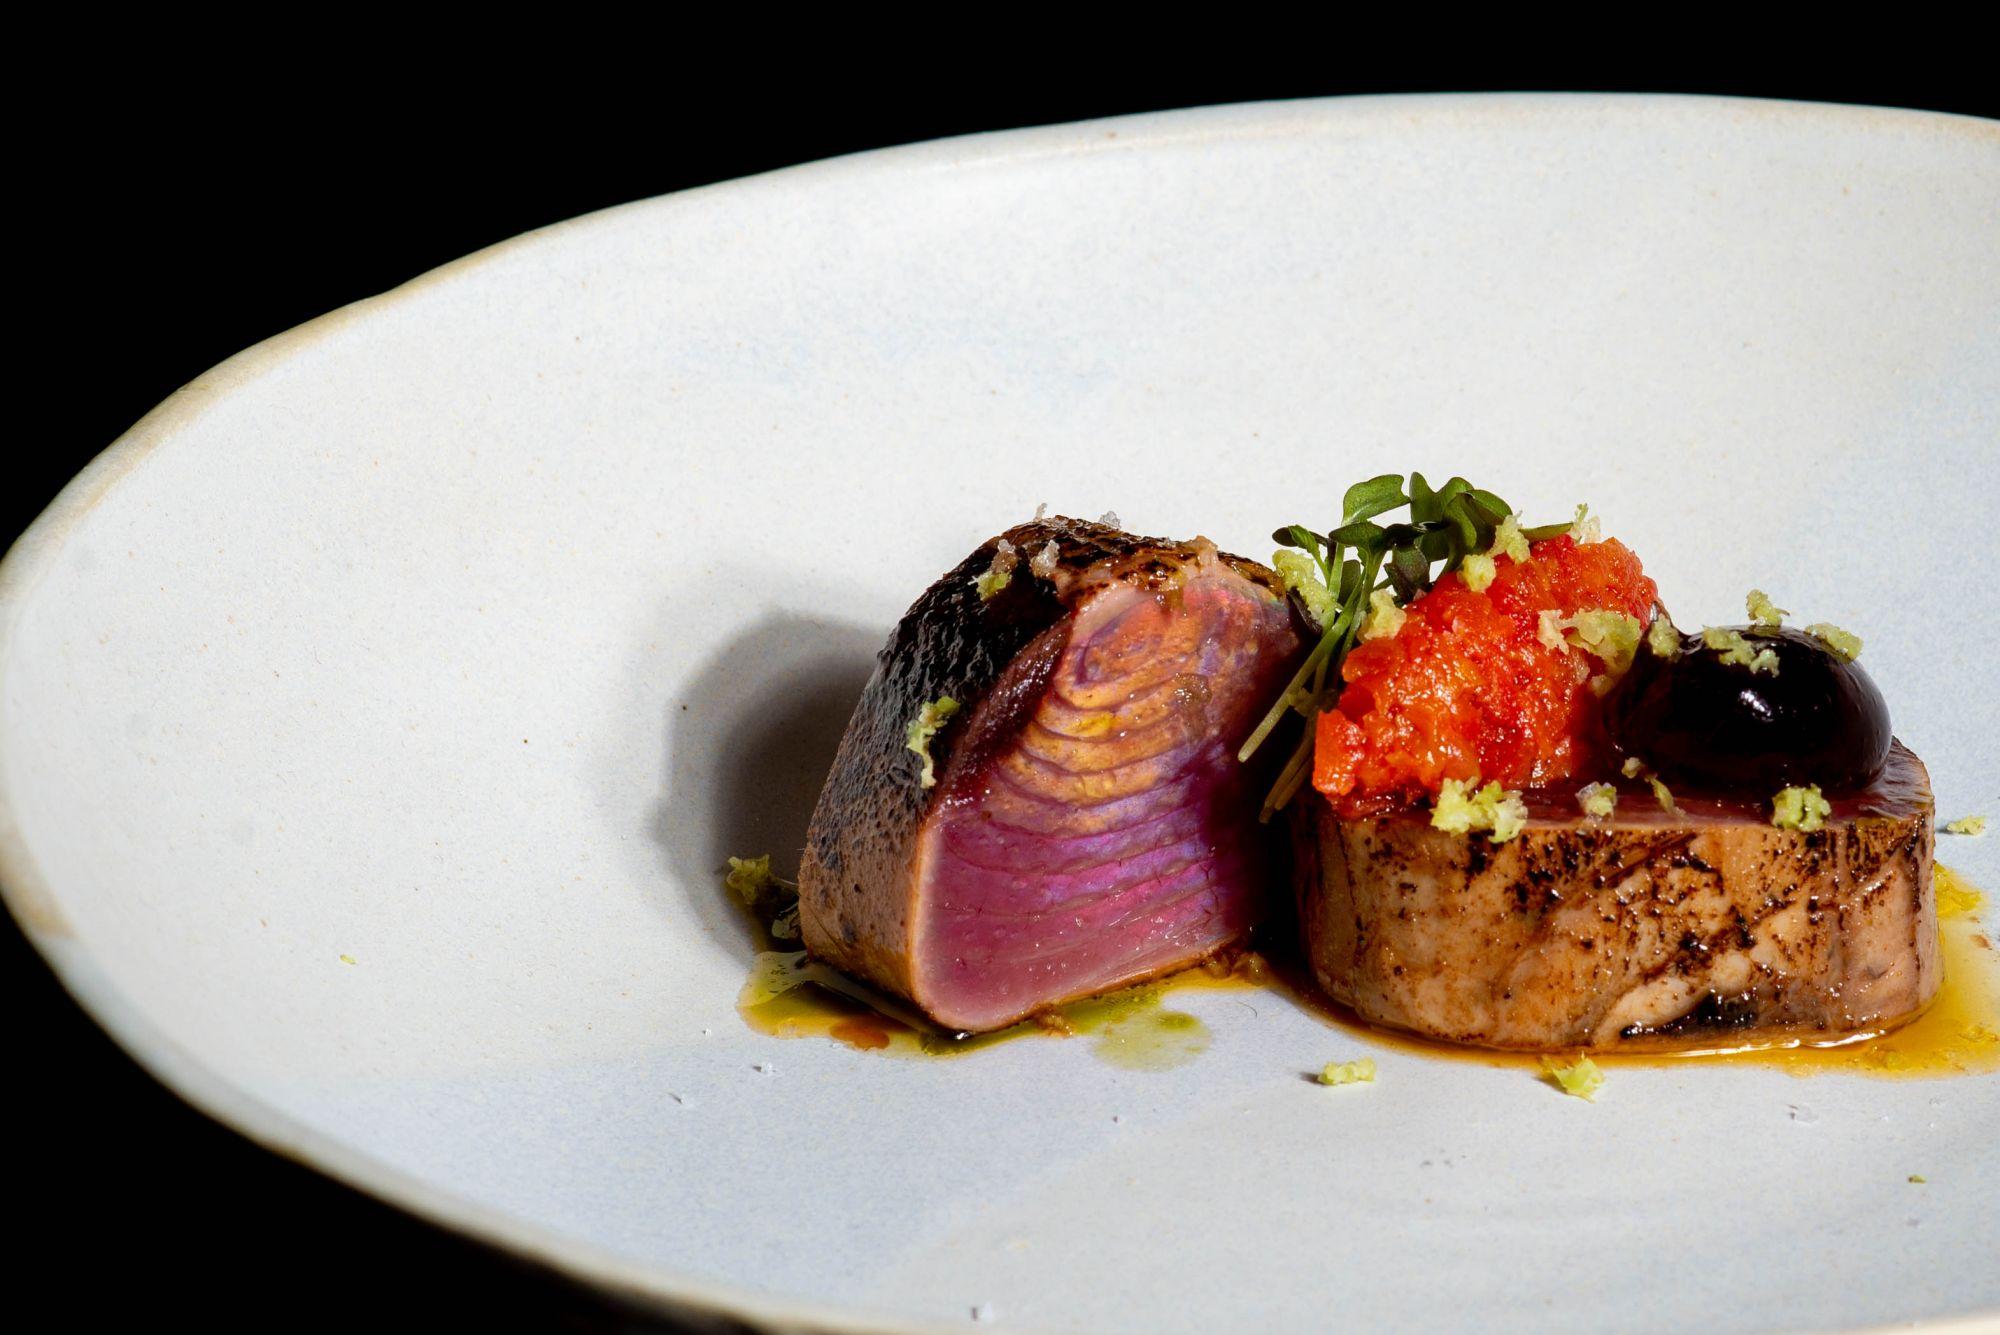 The Ritz-Carlton KL Presents Pleasure On A Plate: Chef Wai's Seasonal Menu At The Library